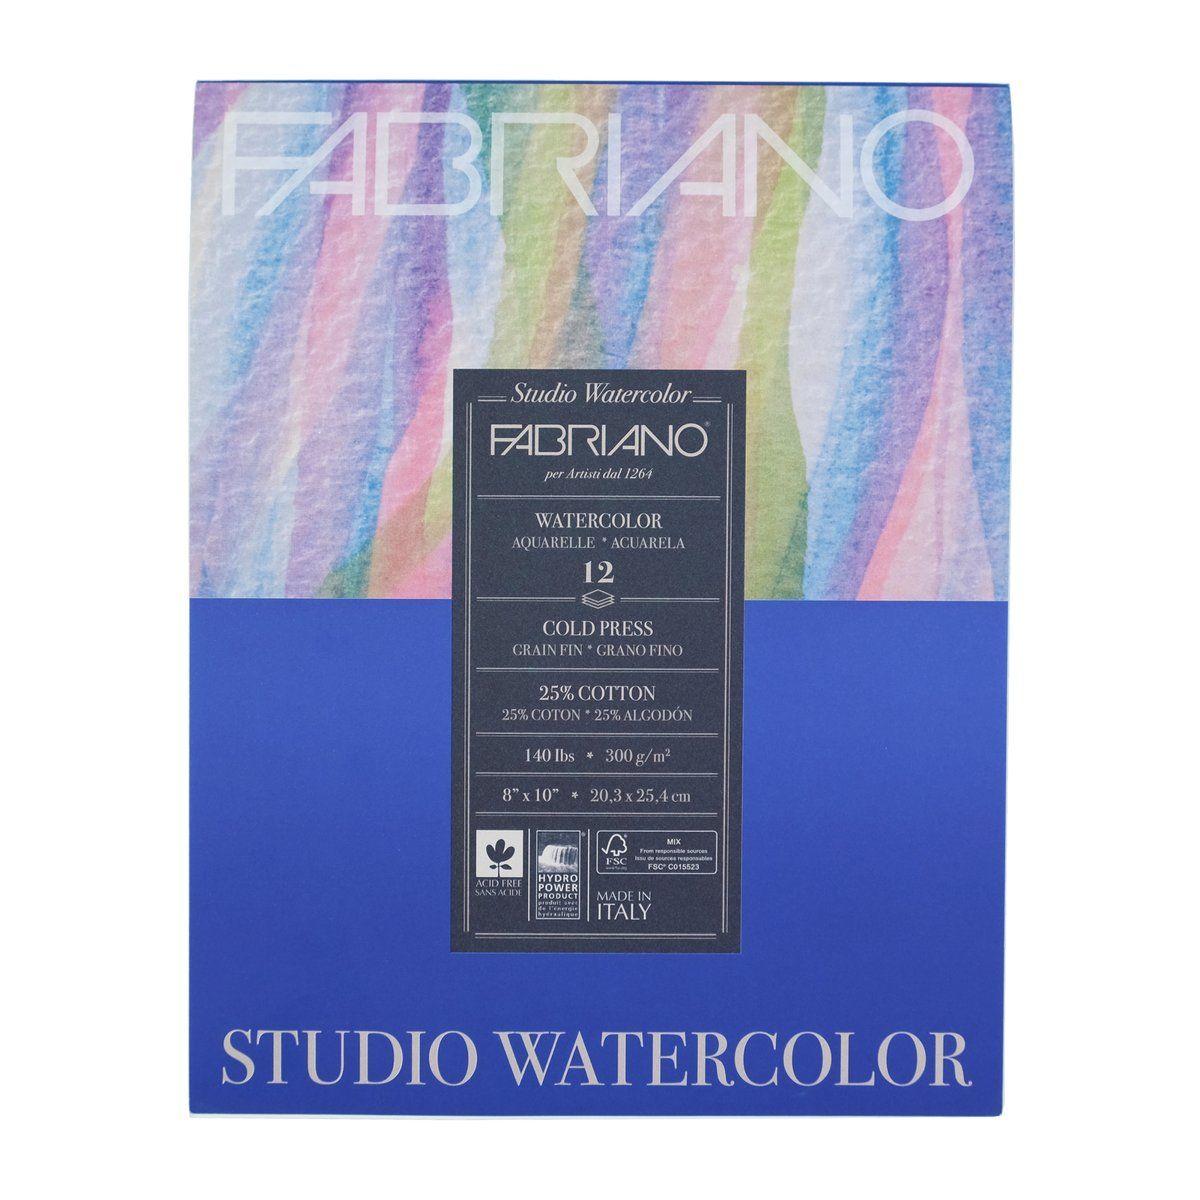 Fabriano Studio Cold Press Watercolor Pad Watercolor Watercolor